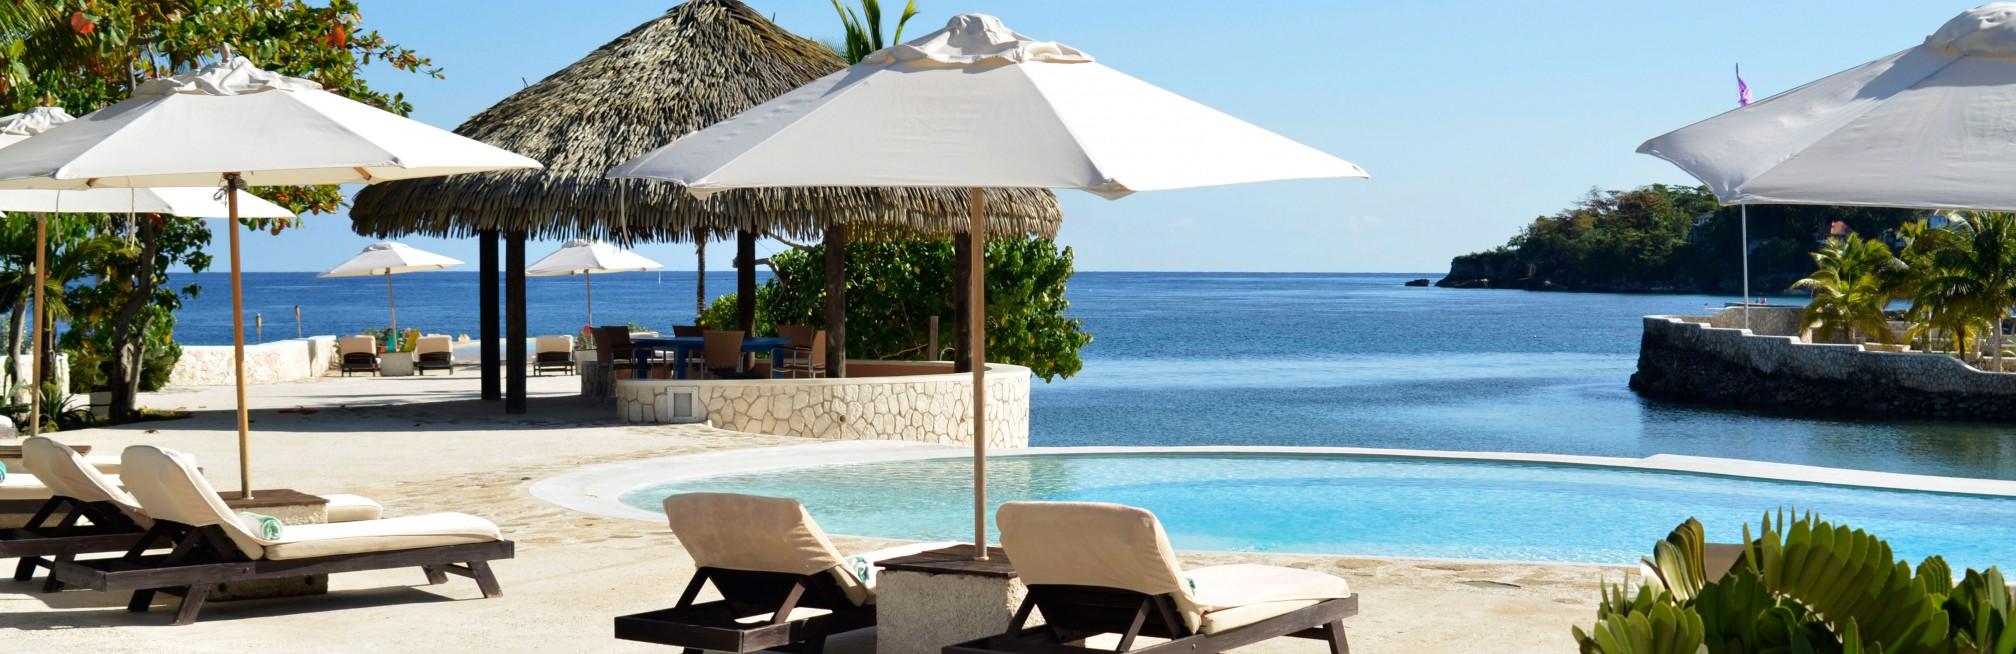 Win a three-night wellness escape in Jamaica (worth $4,300)